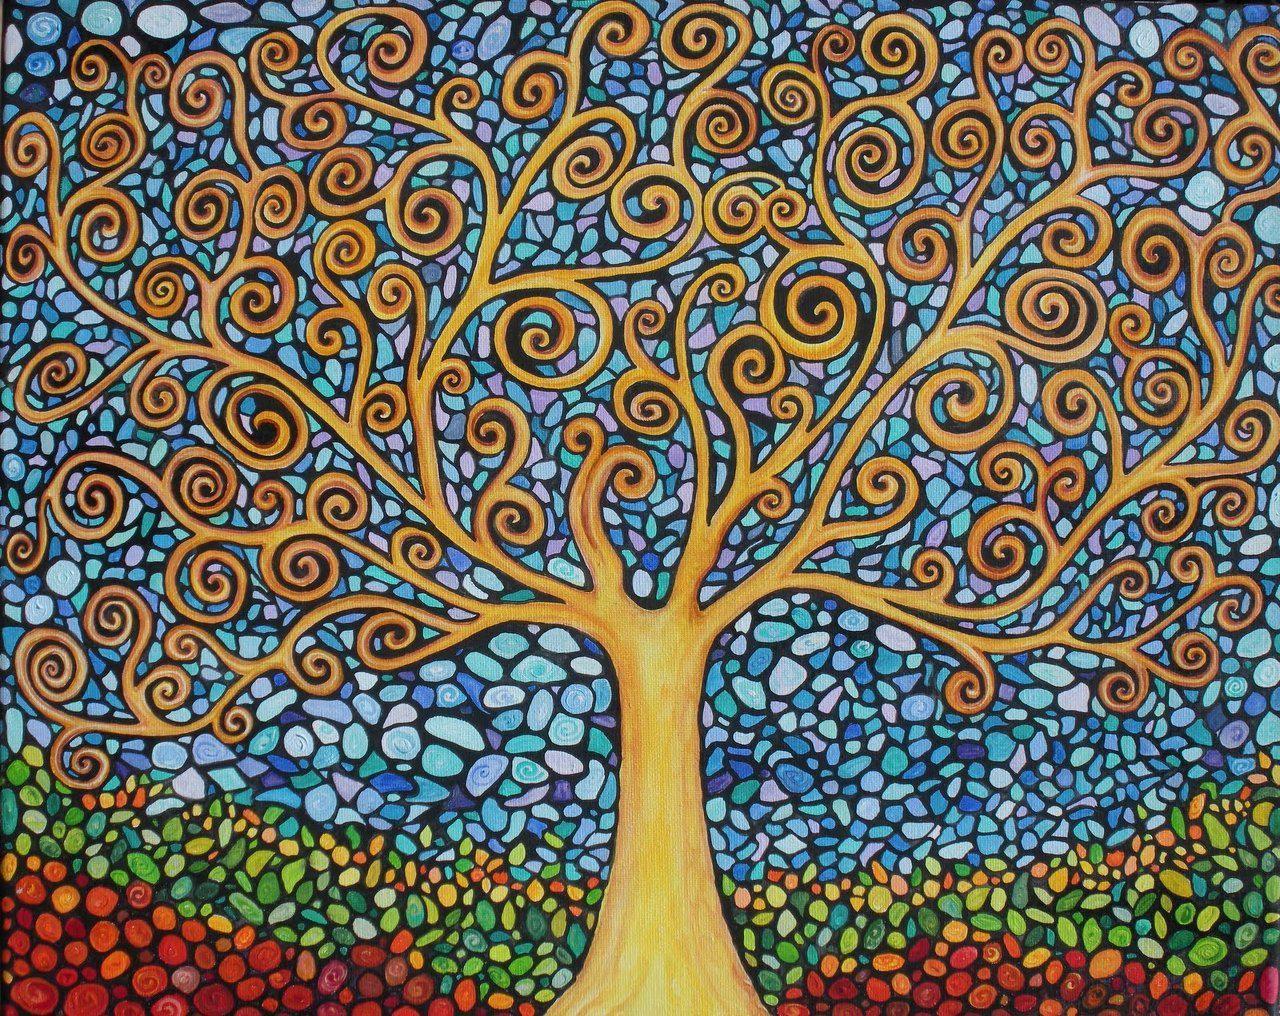 klimt tree of life mosaic style | Trees | Pinterest | Klimt, Mosaics ...